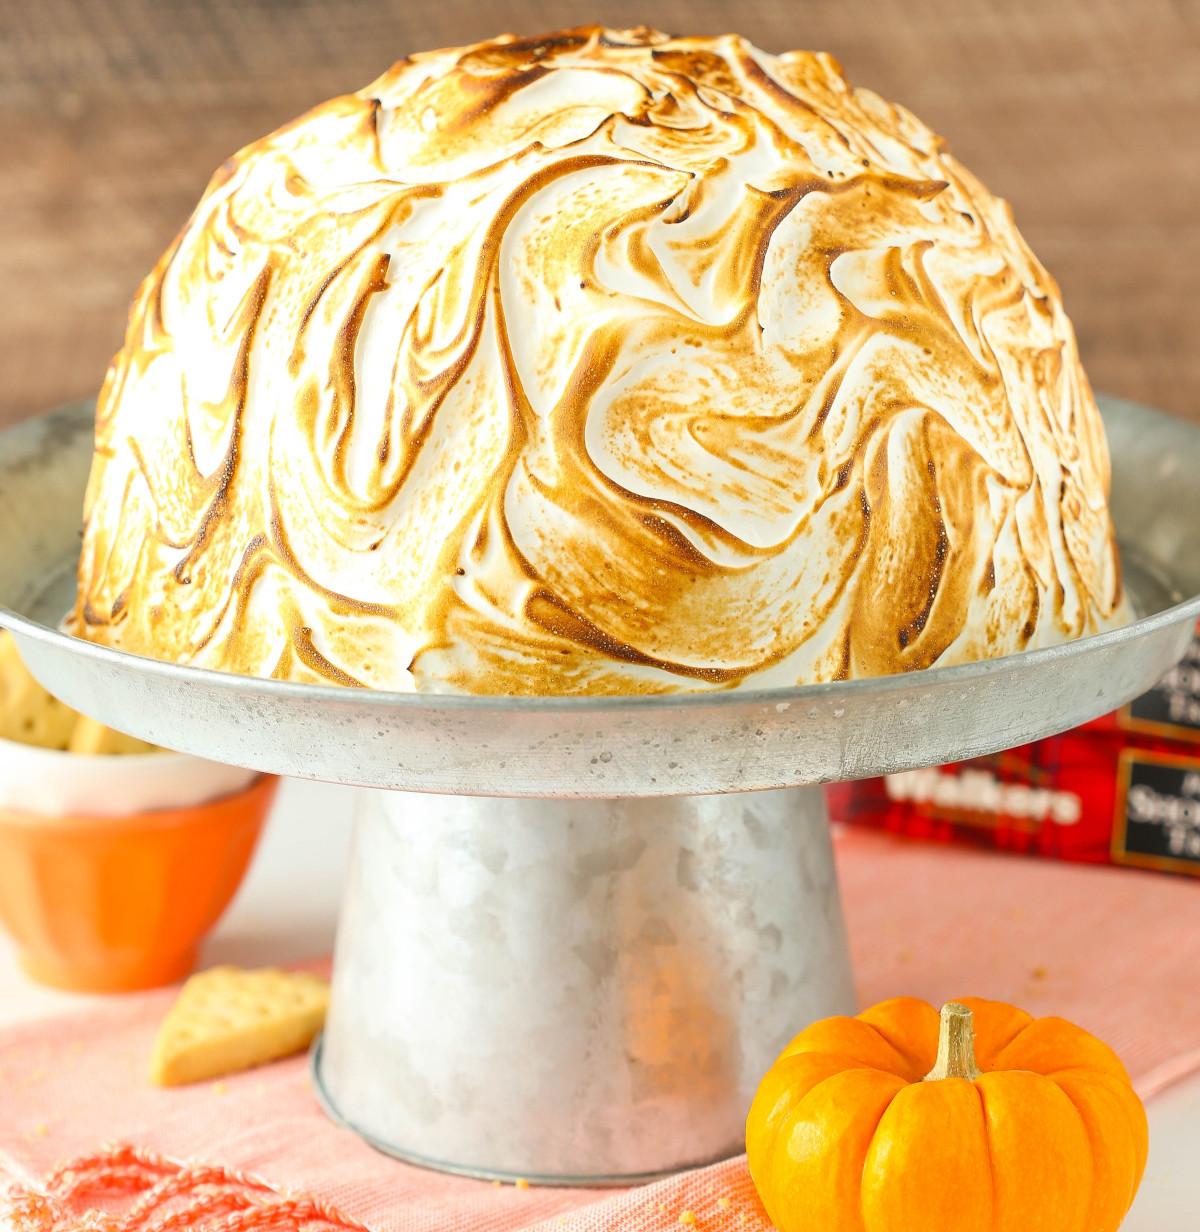 Pumpkin Spice Baked Alaska